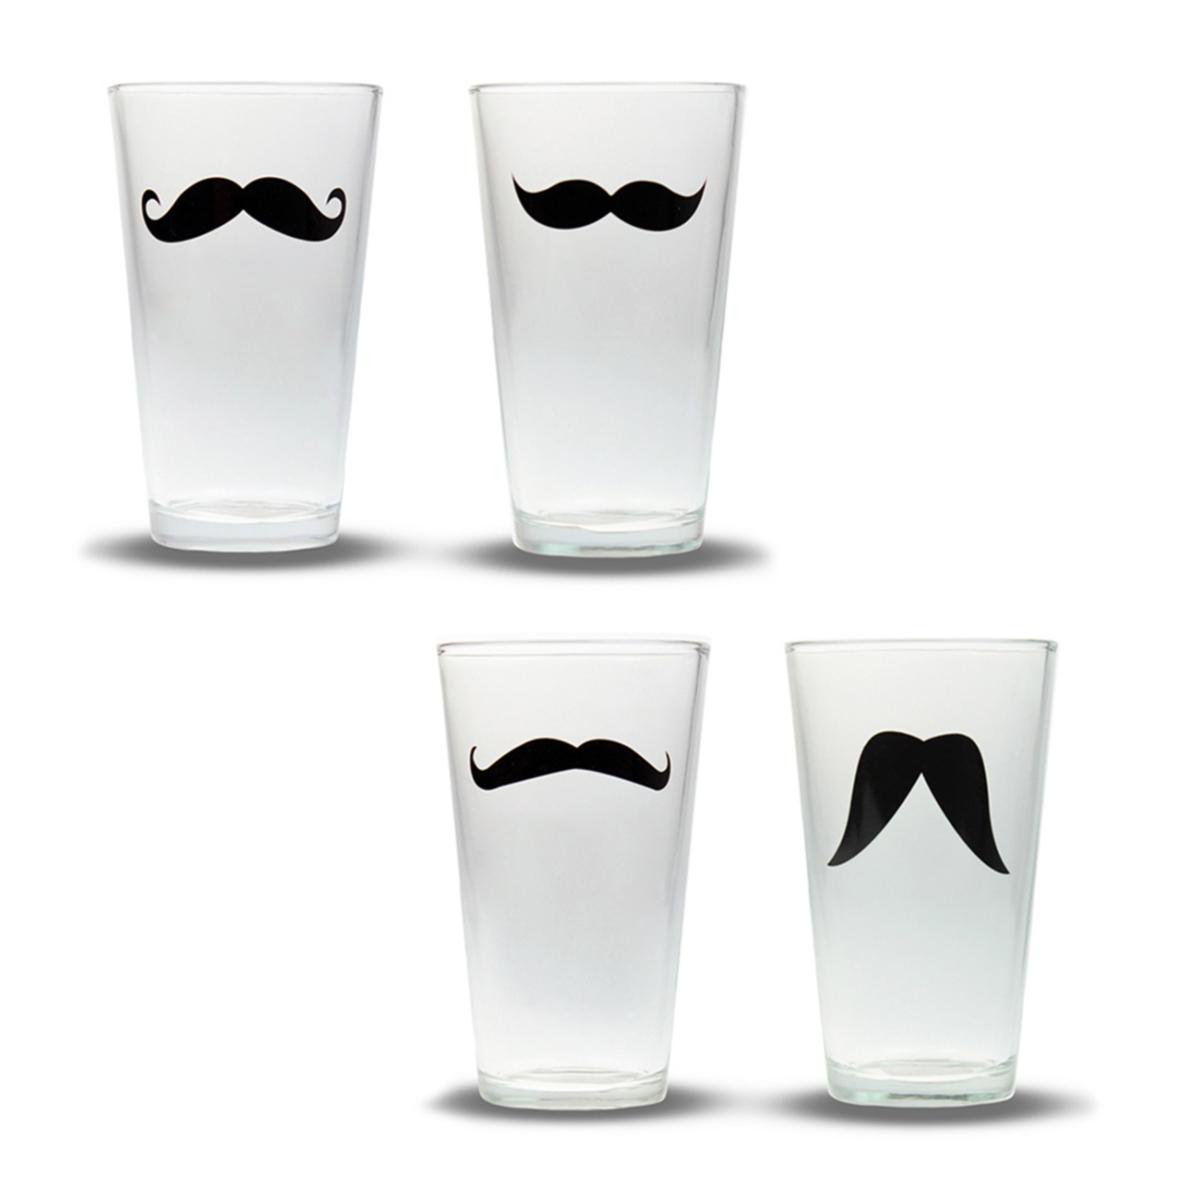 Schnurrbart Gläser - 4er Set - 2